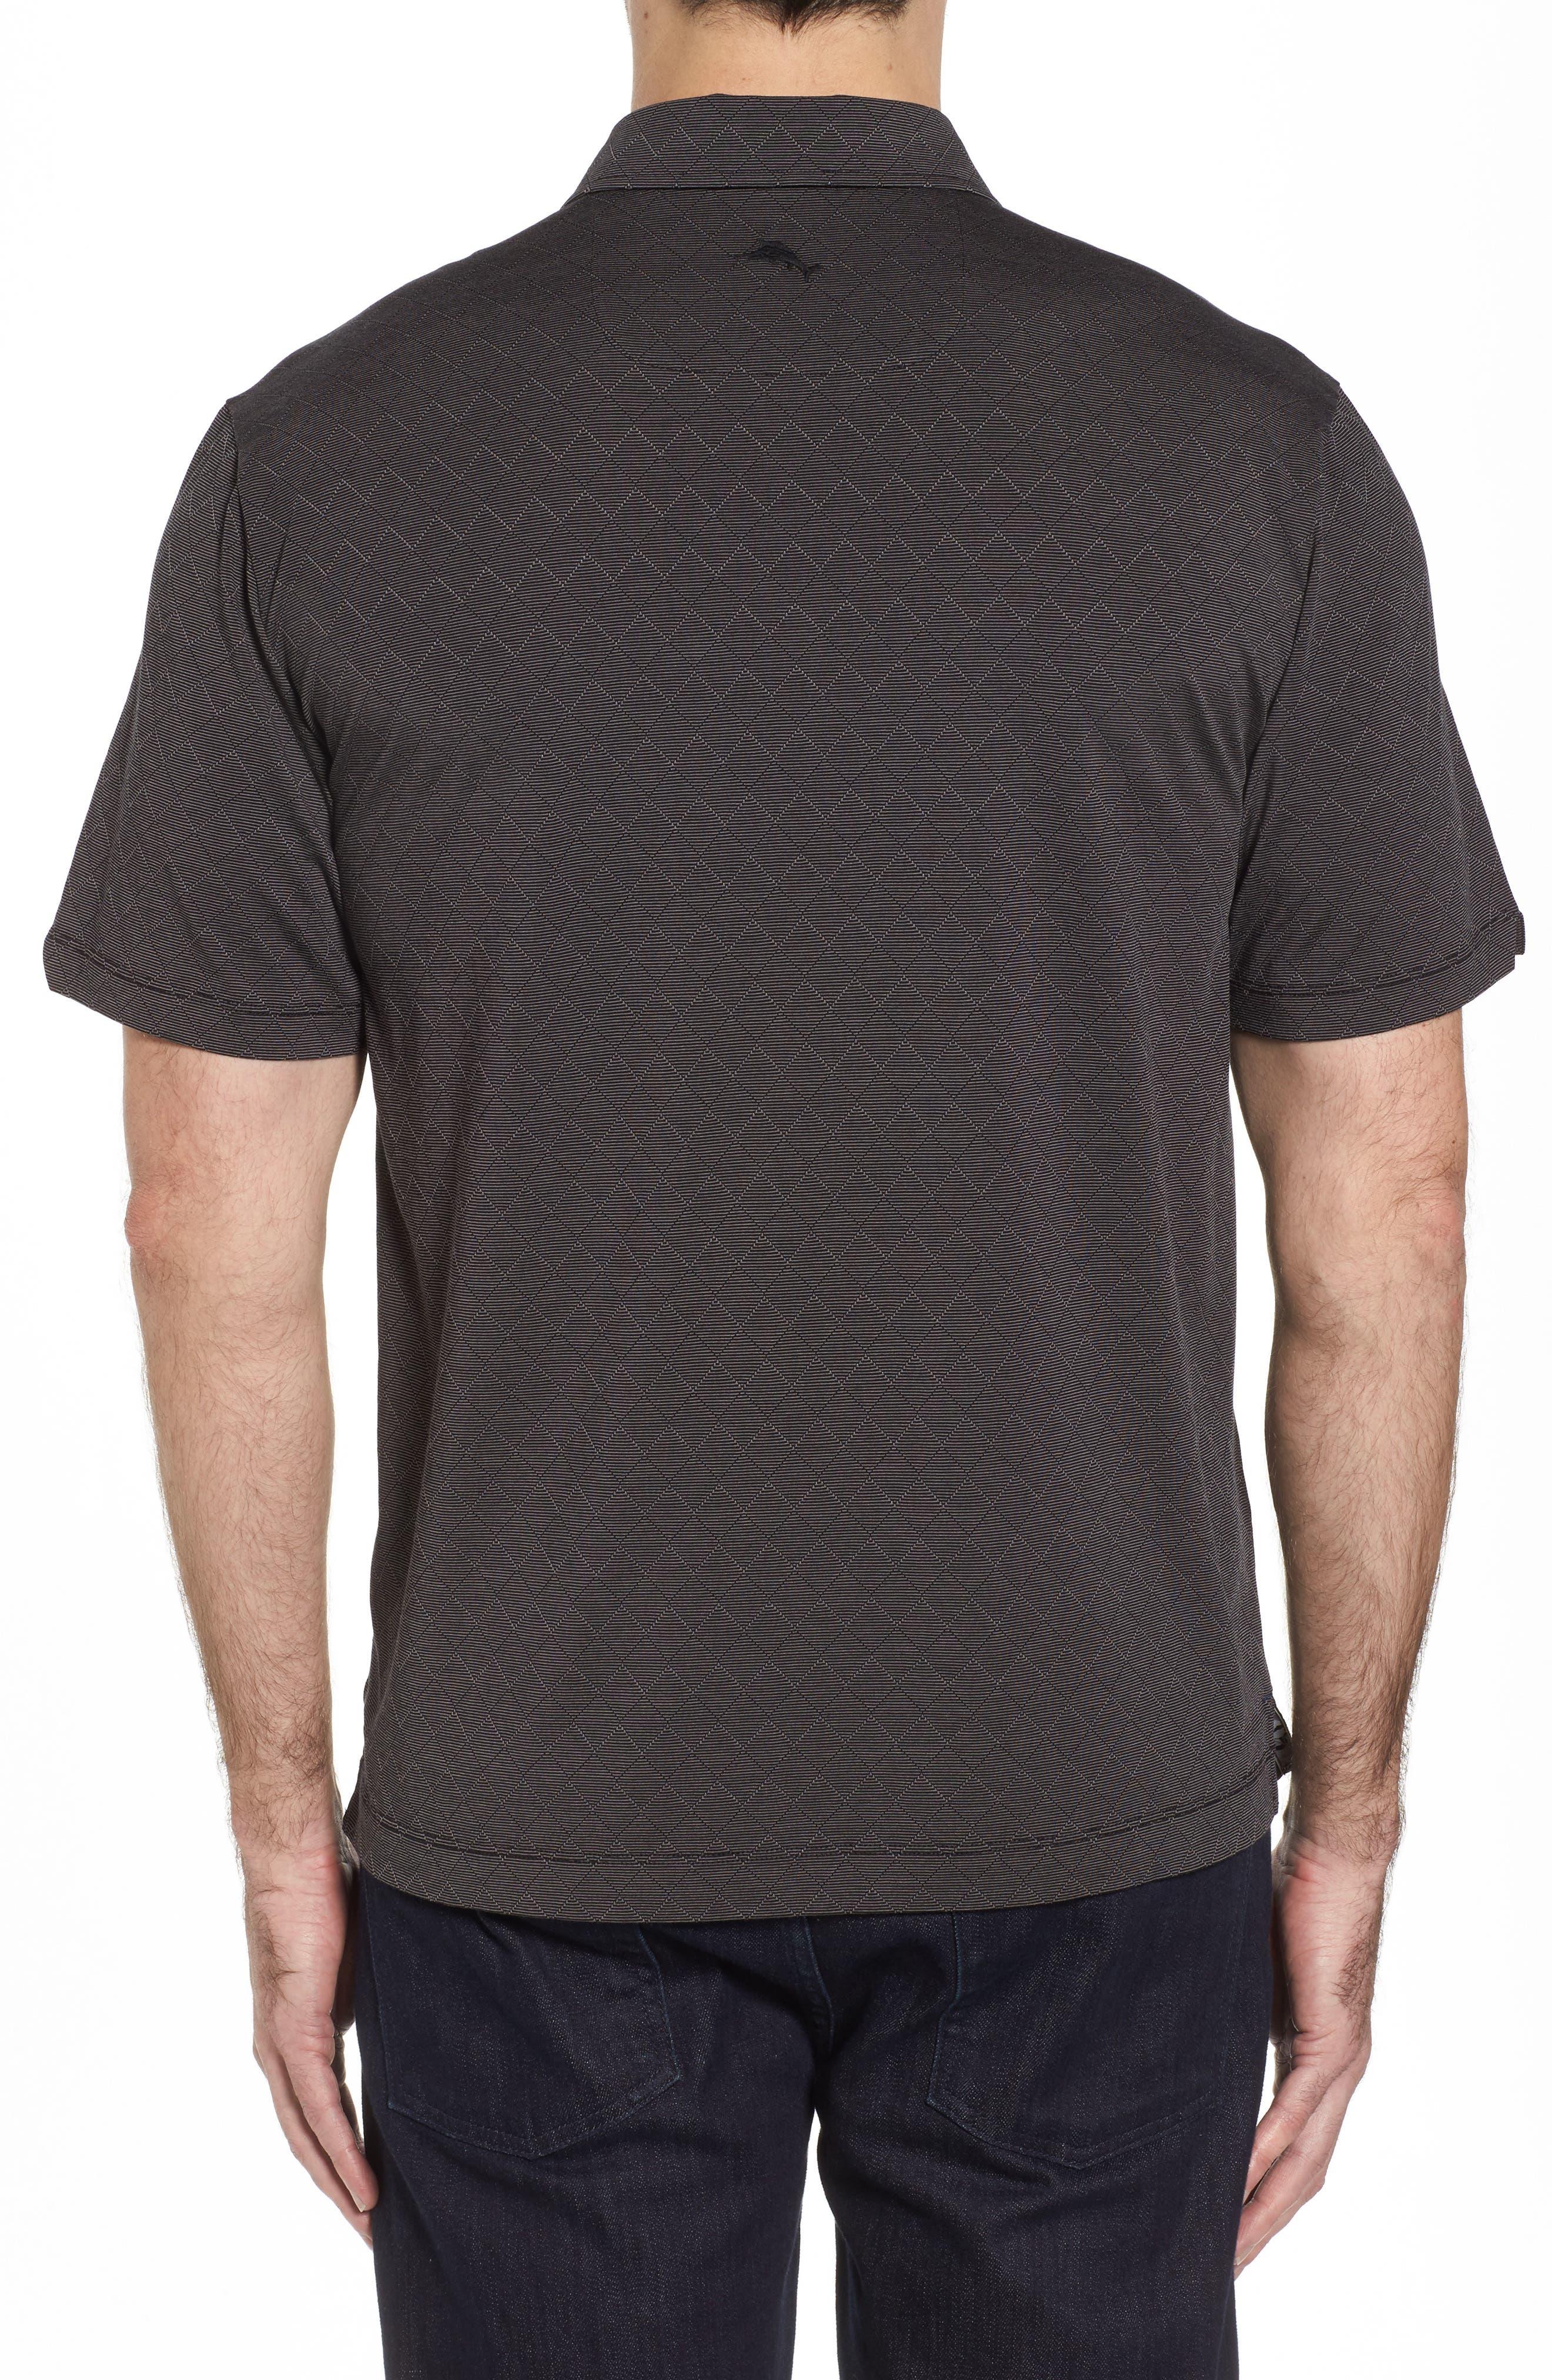 Alternate Image 2  - Tommy Bahama Diamond Drift Spectator Polo Shirt